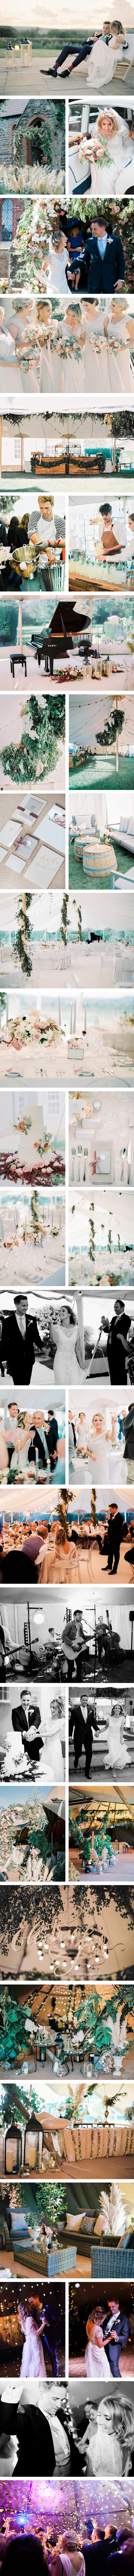 Annika & Richard's PapaKåta Sperry & Teepee Wedding